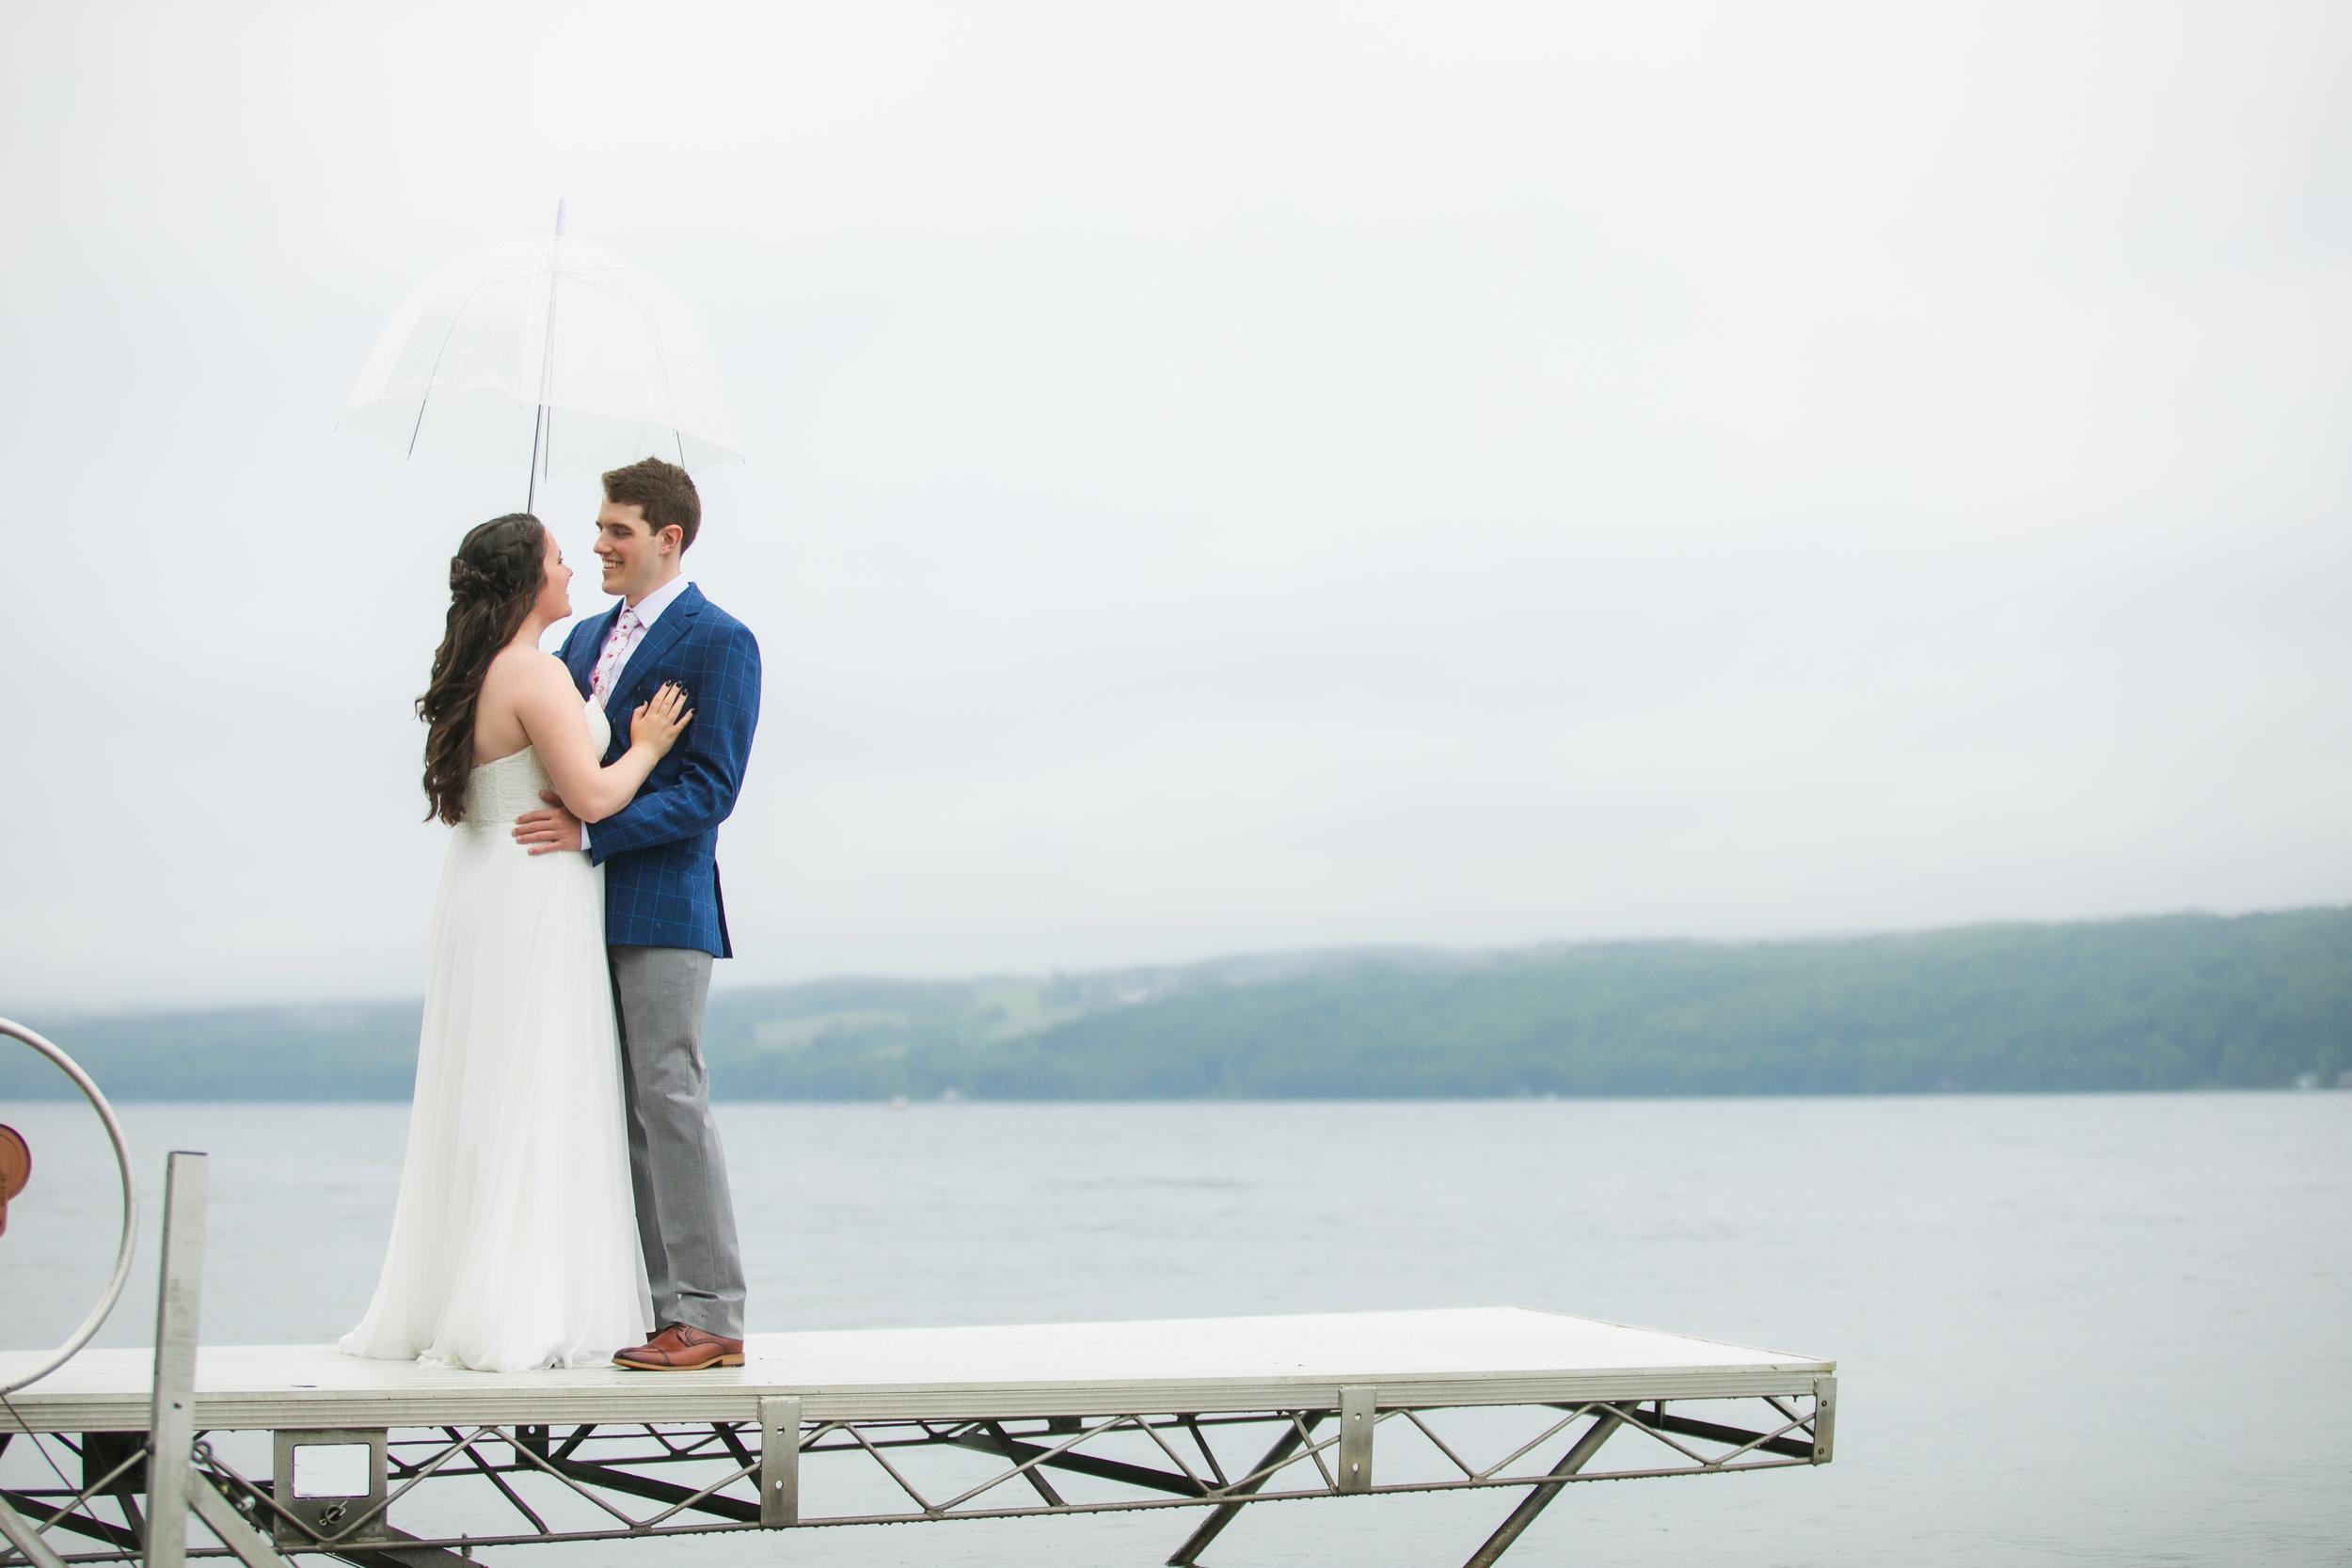 Ariel Bouffard & Branden Hummer | Aster weddings and events, skaneateles